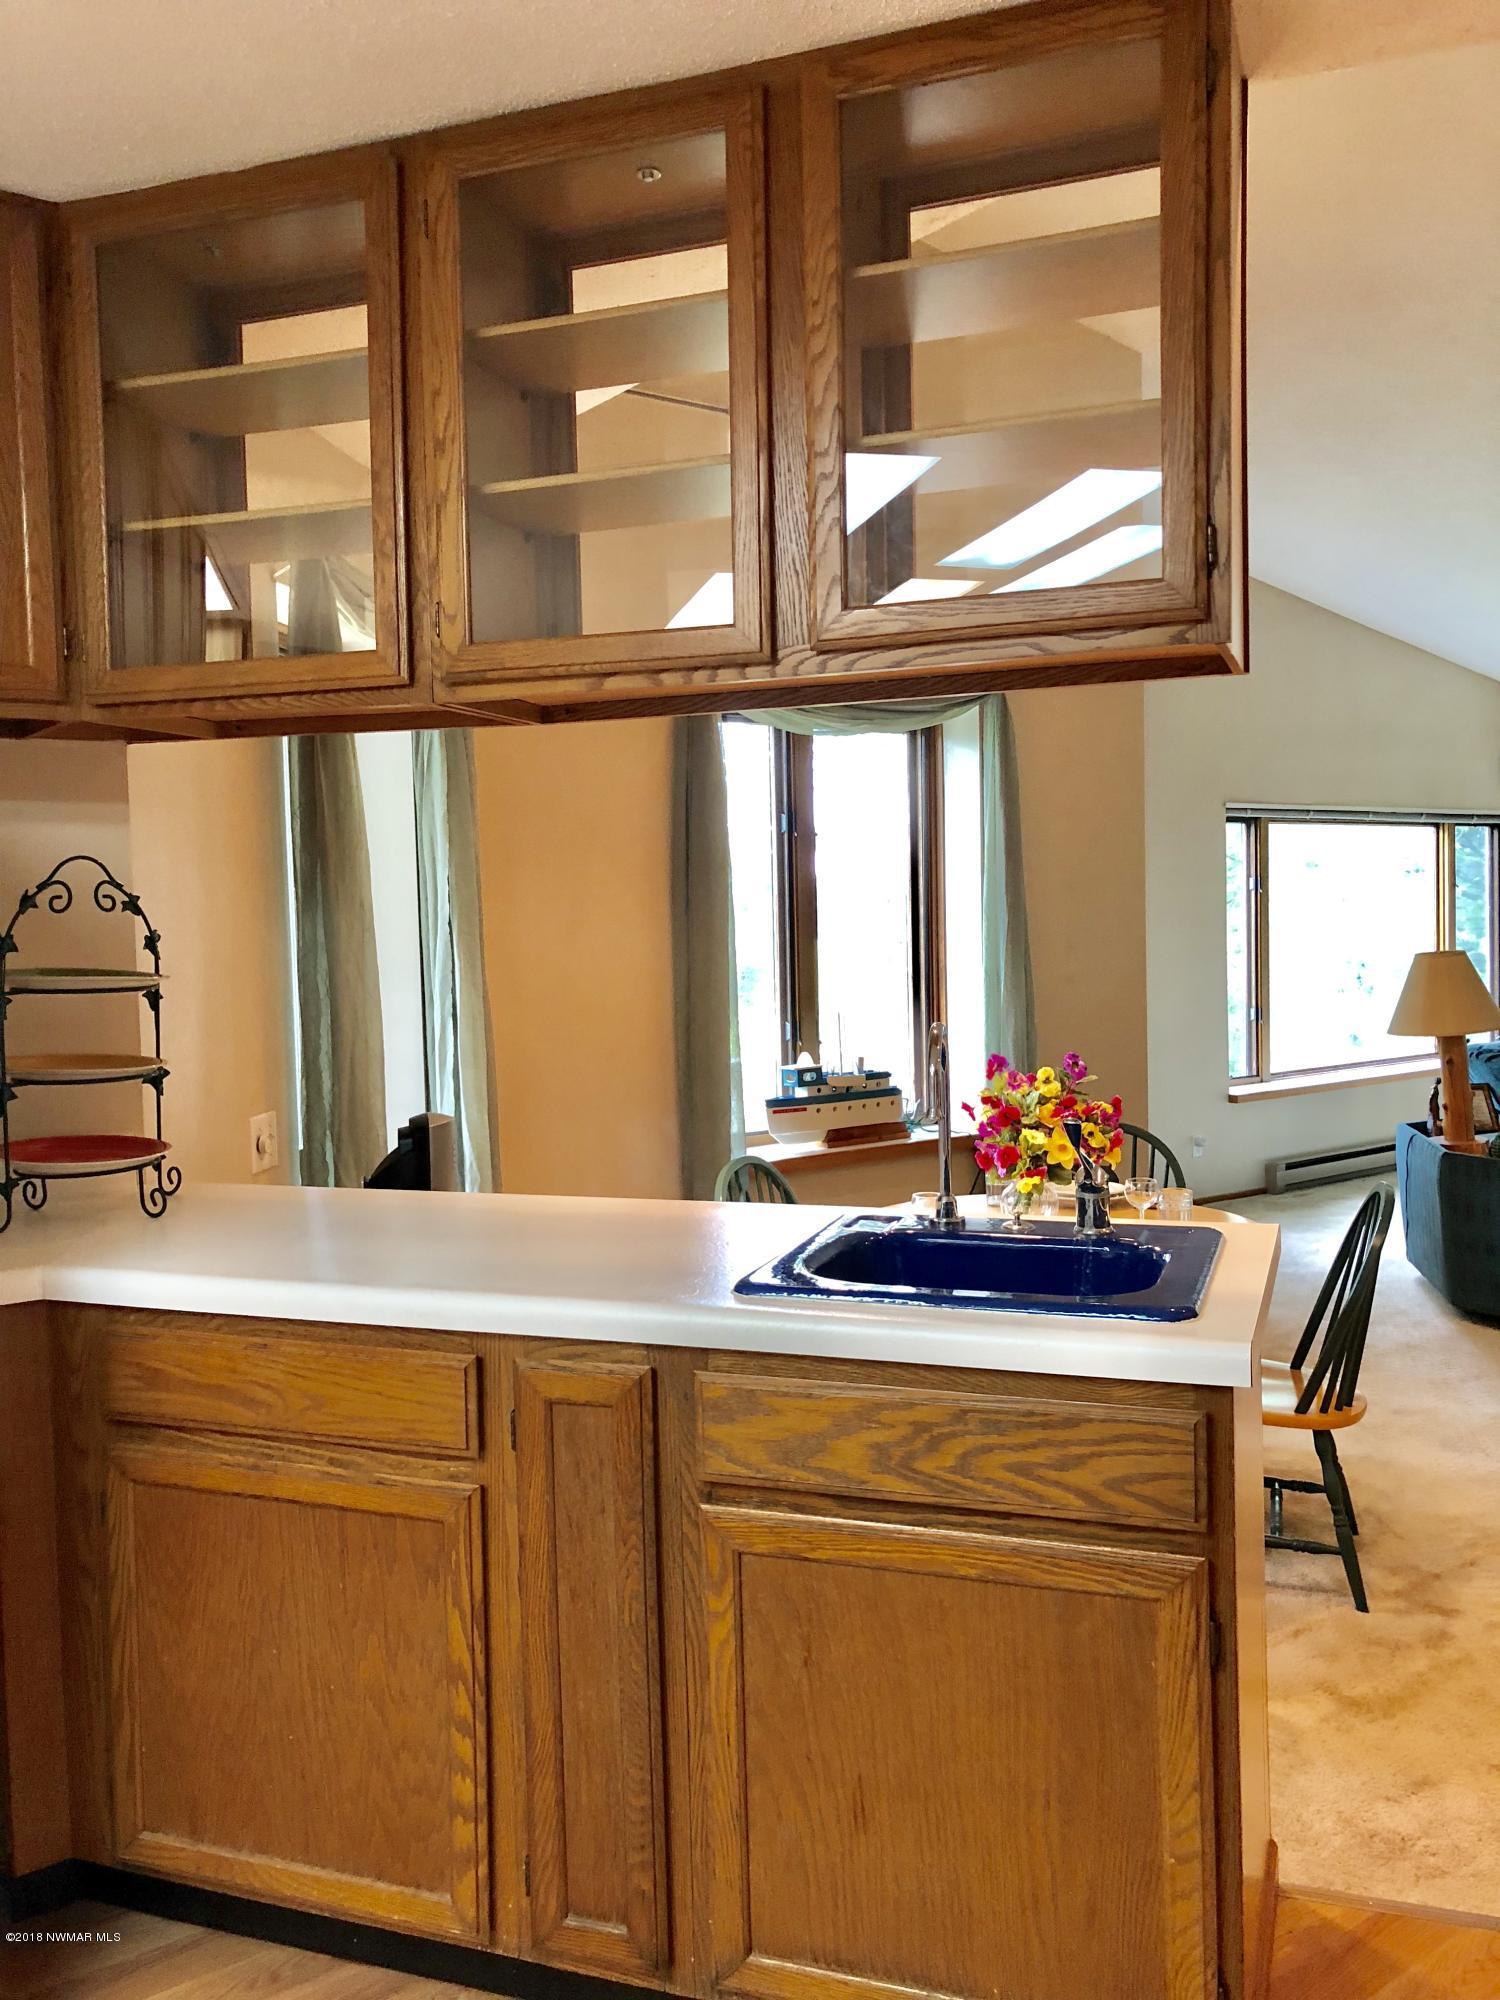 Kitchen with 2 sinks